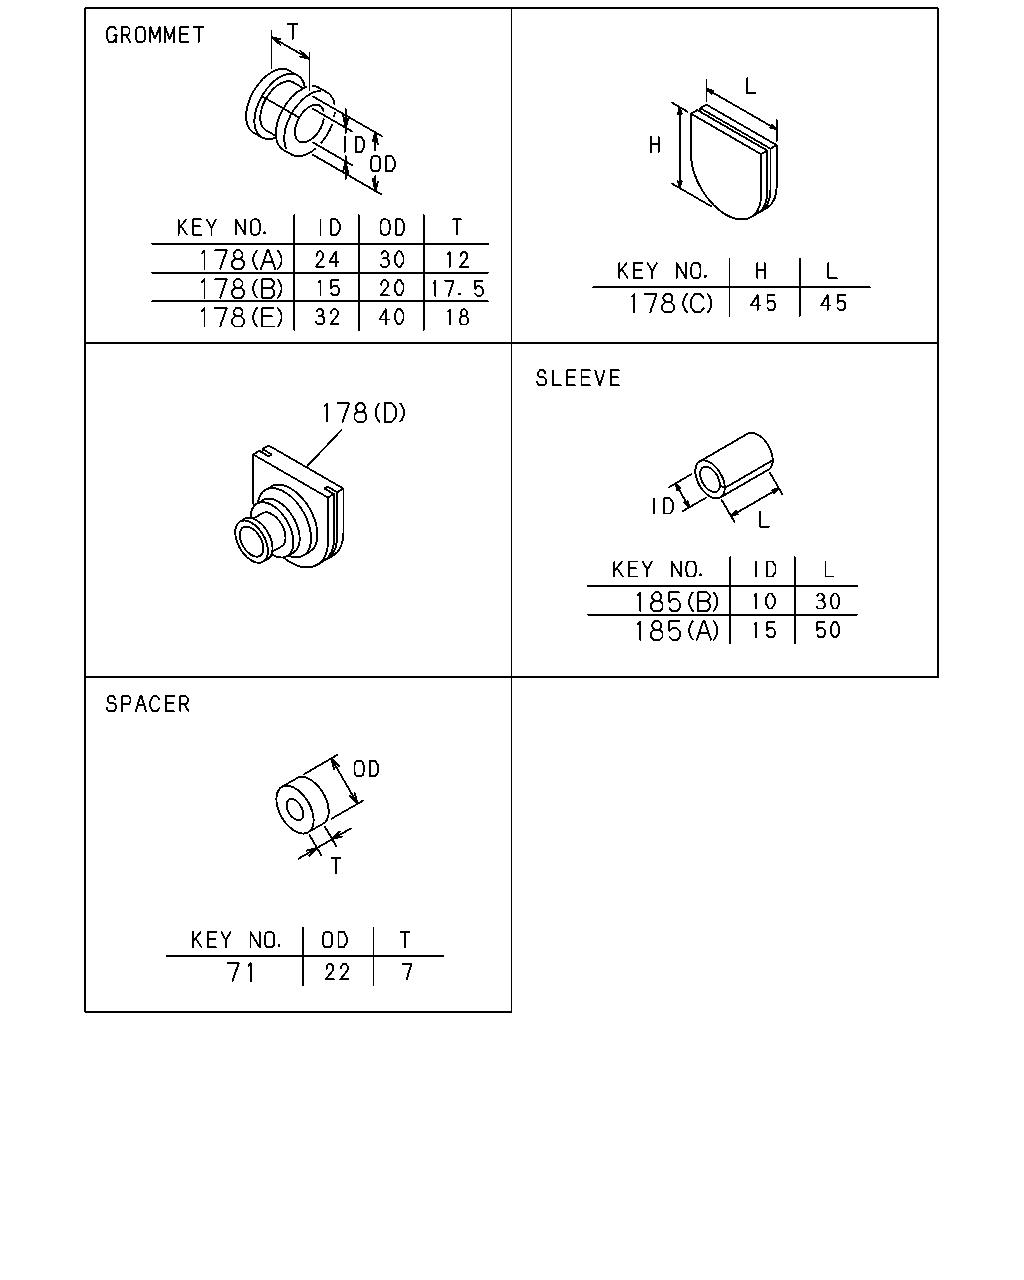 hight resolution of wiring diagram grommet key wiring diagrams scematic rh 51 jessicadonath de wiring diagram symbols ge wiring diagram symbol key